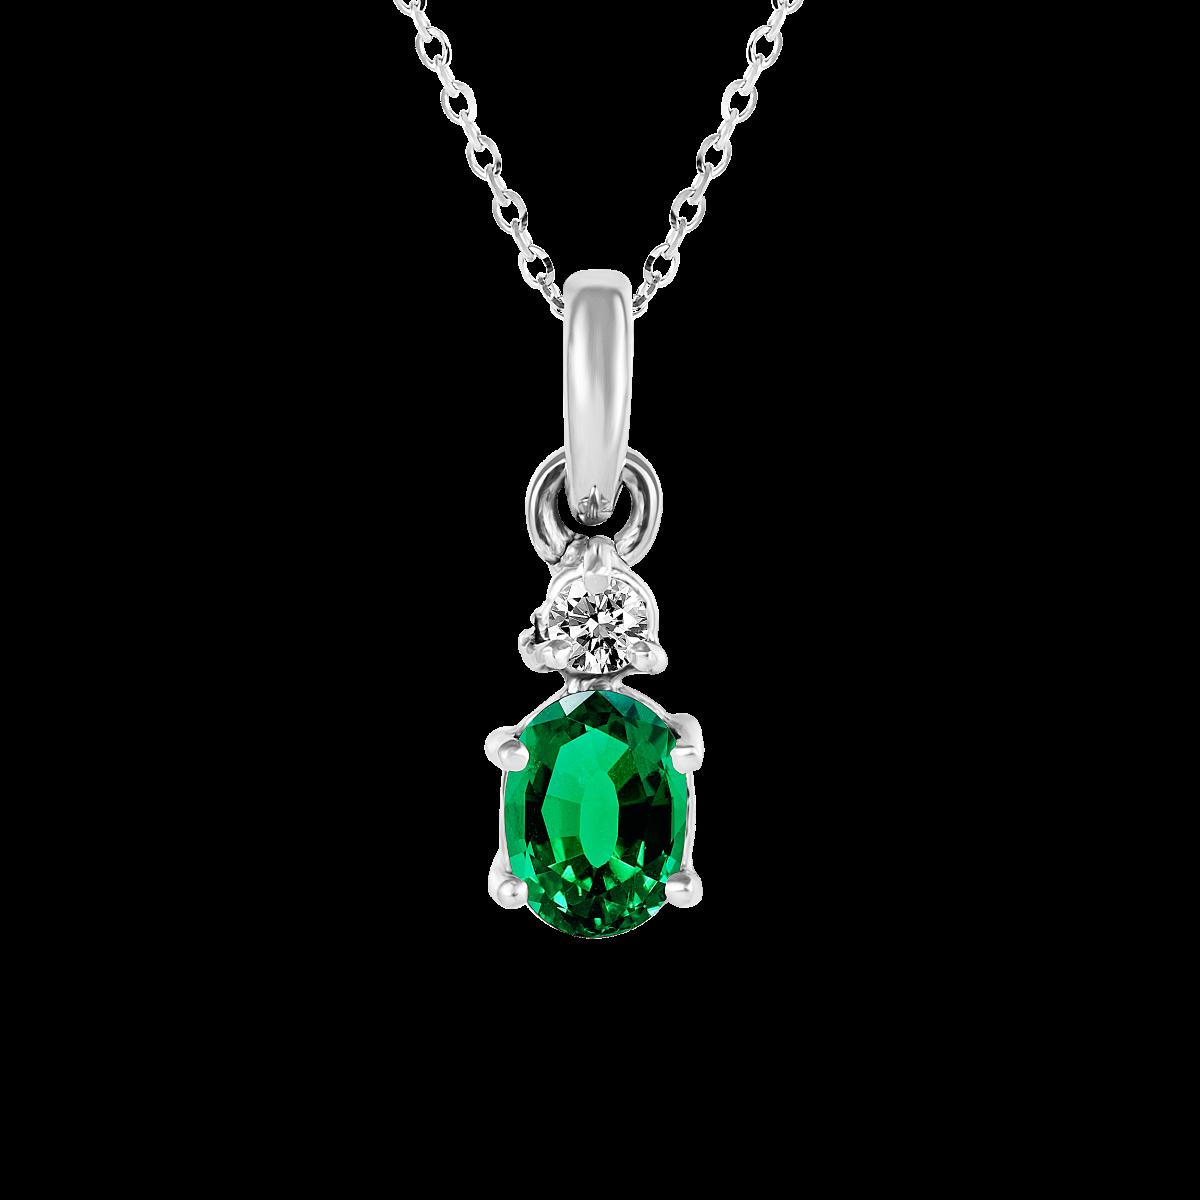 Pendente de esmeralda e diamantes ouro branco